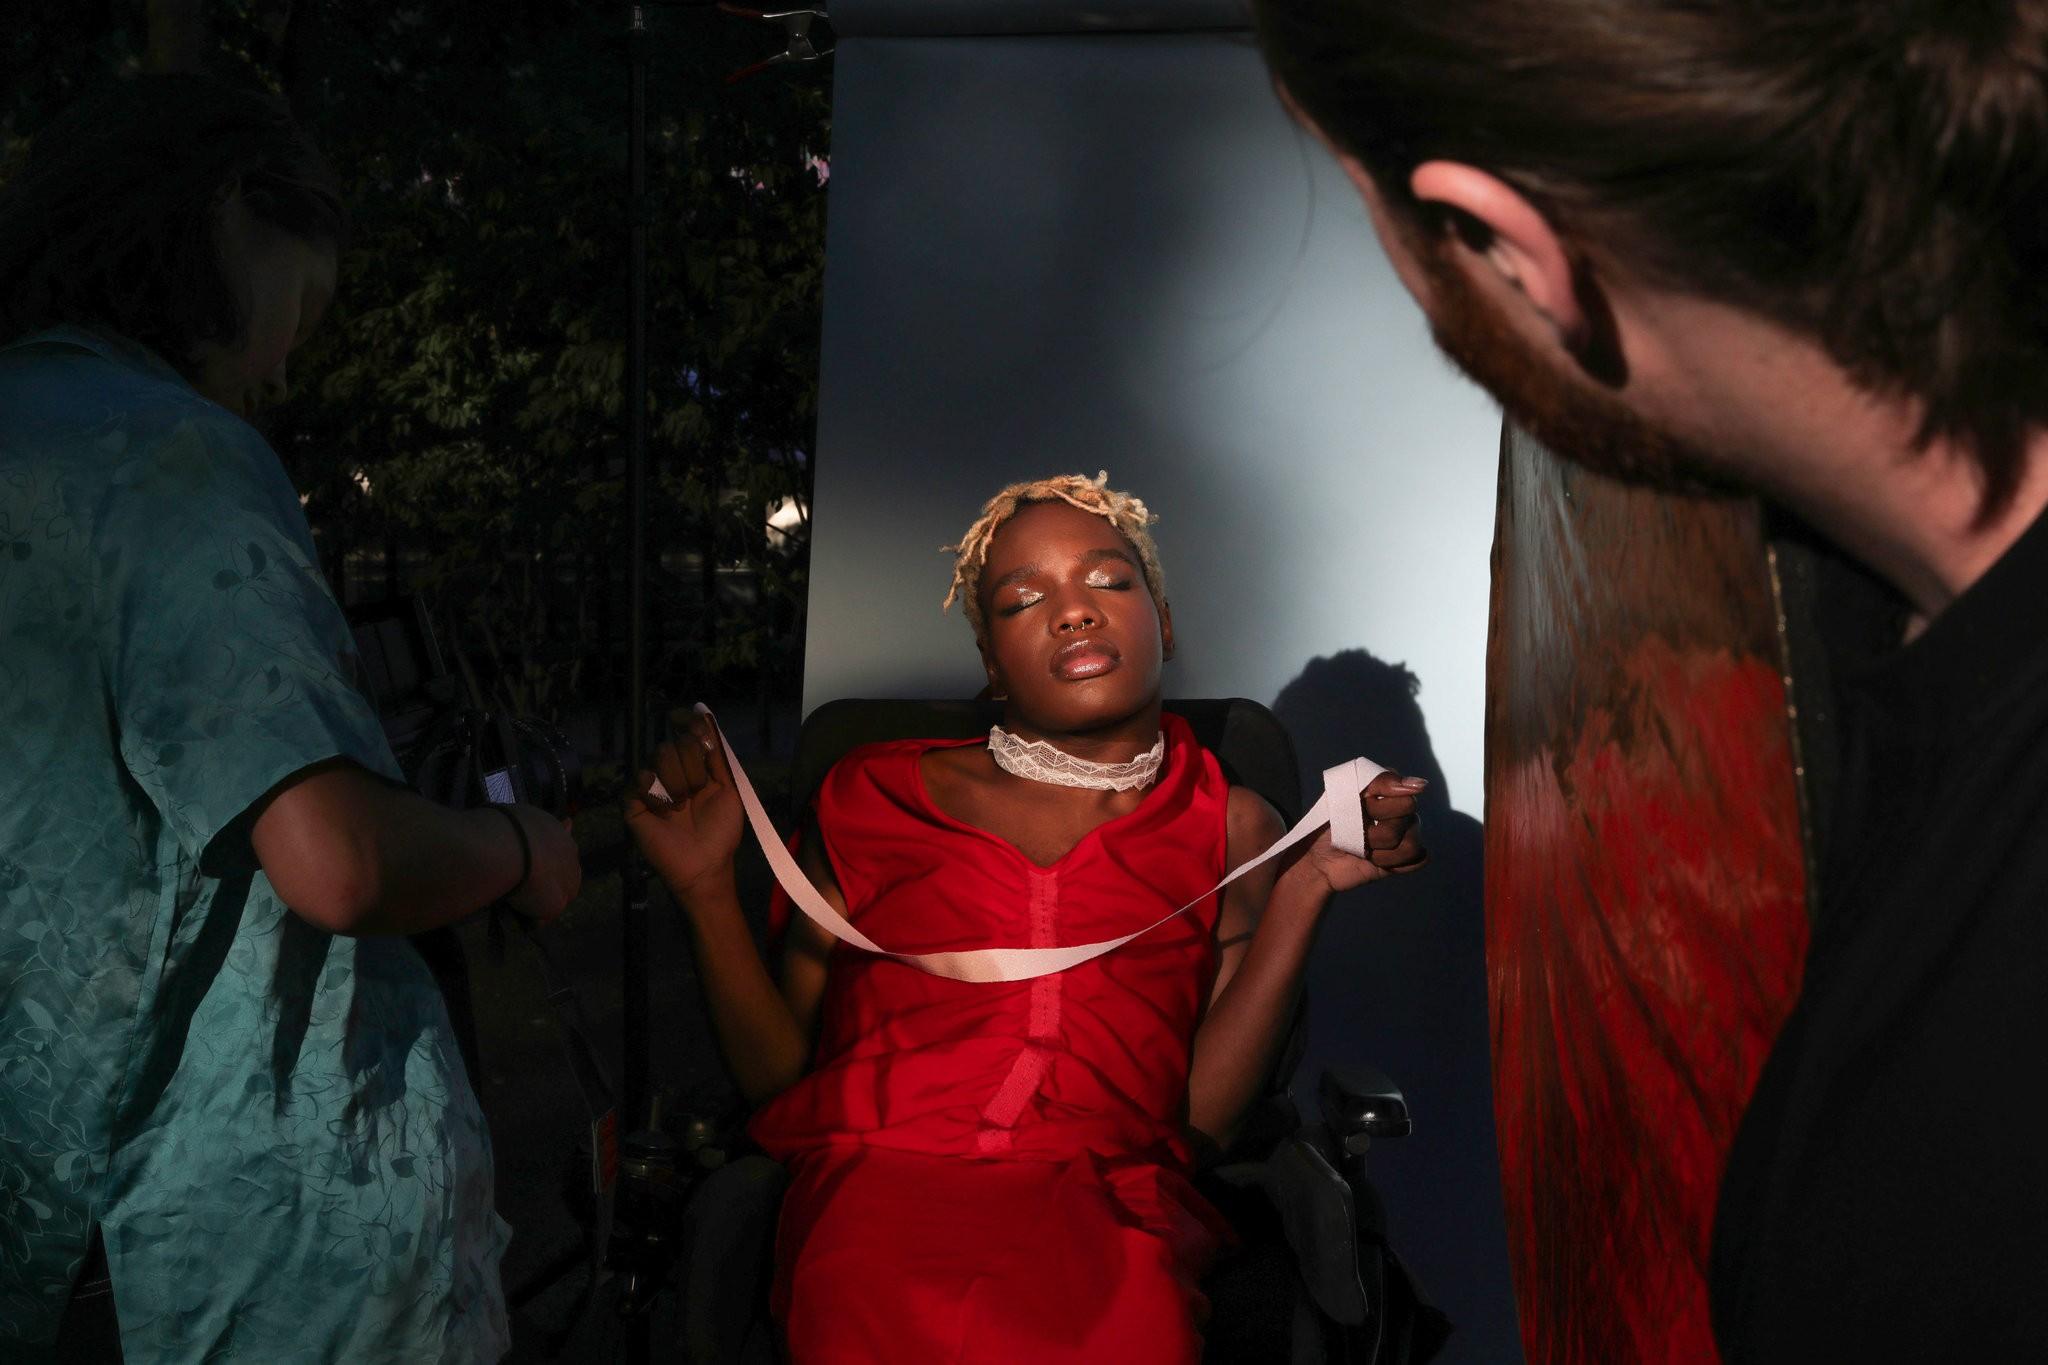 Aaron Philip poses at a photo shoot at McCarren Park in Brooklyn. Credit: Gabriella Angotti-Jones/The New York Times